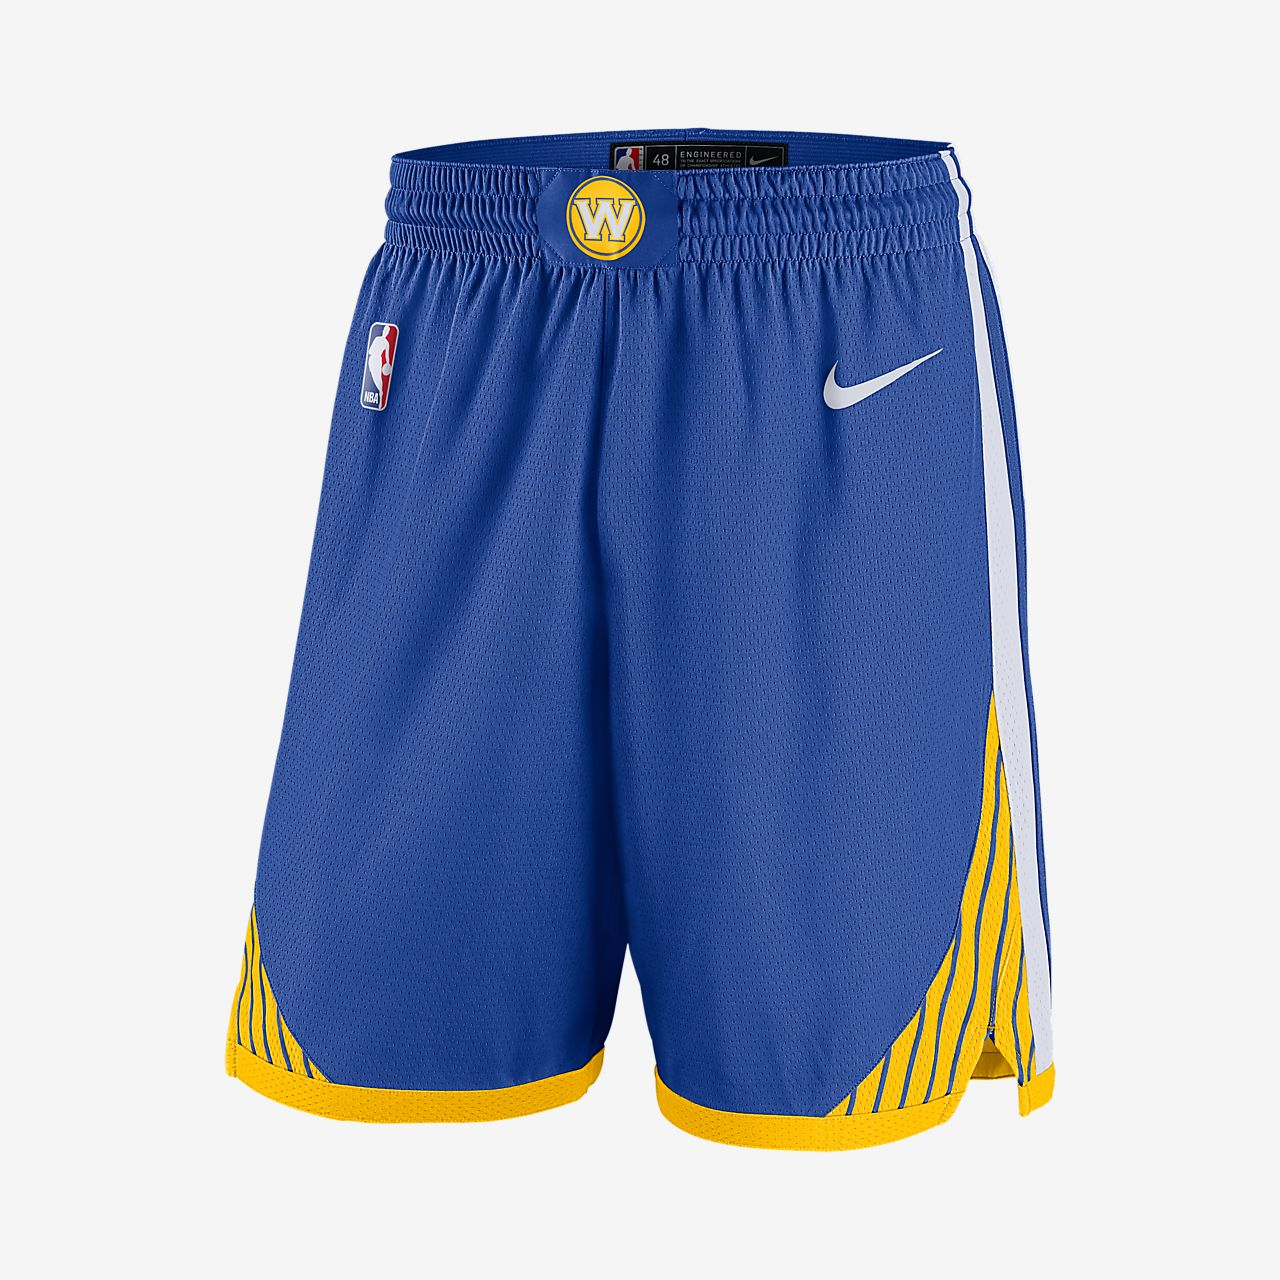 Shorts NBA Golden State Warriors Nike Icon Edition Swingman - Uomo